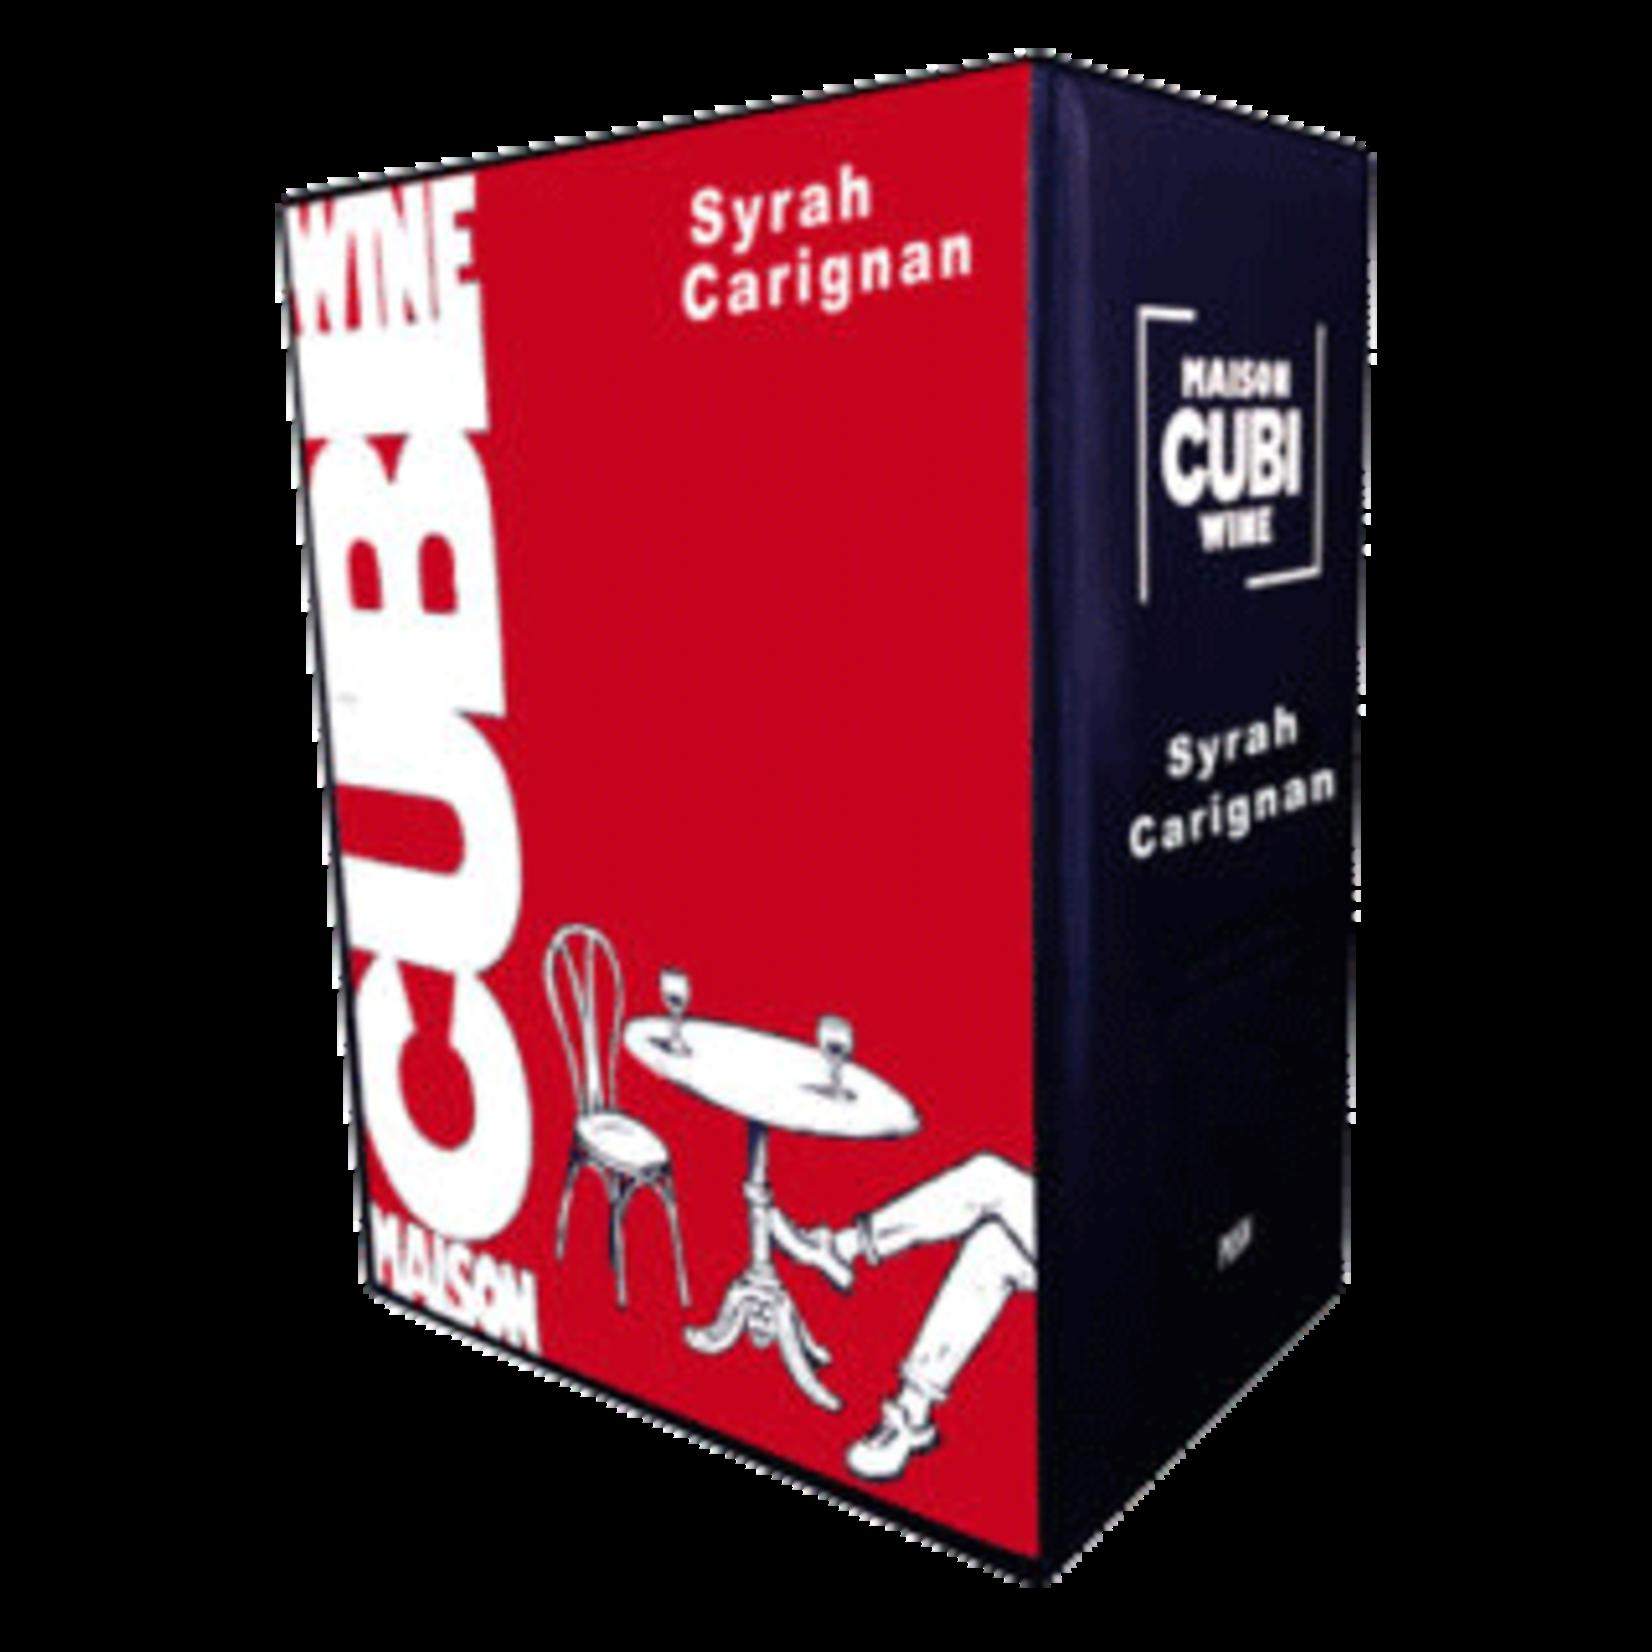 Wine Maison Cubi Syrah Carignan 3L in a Box